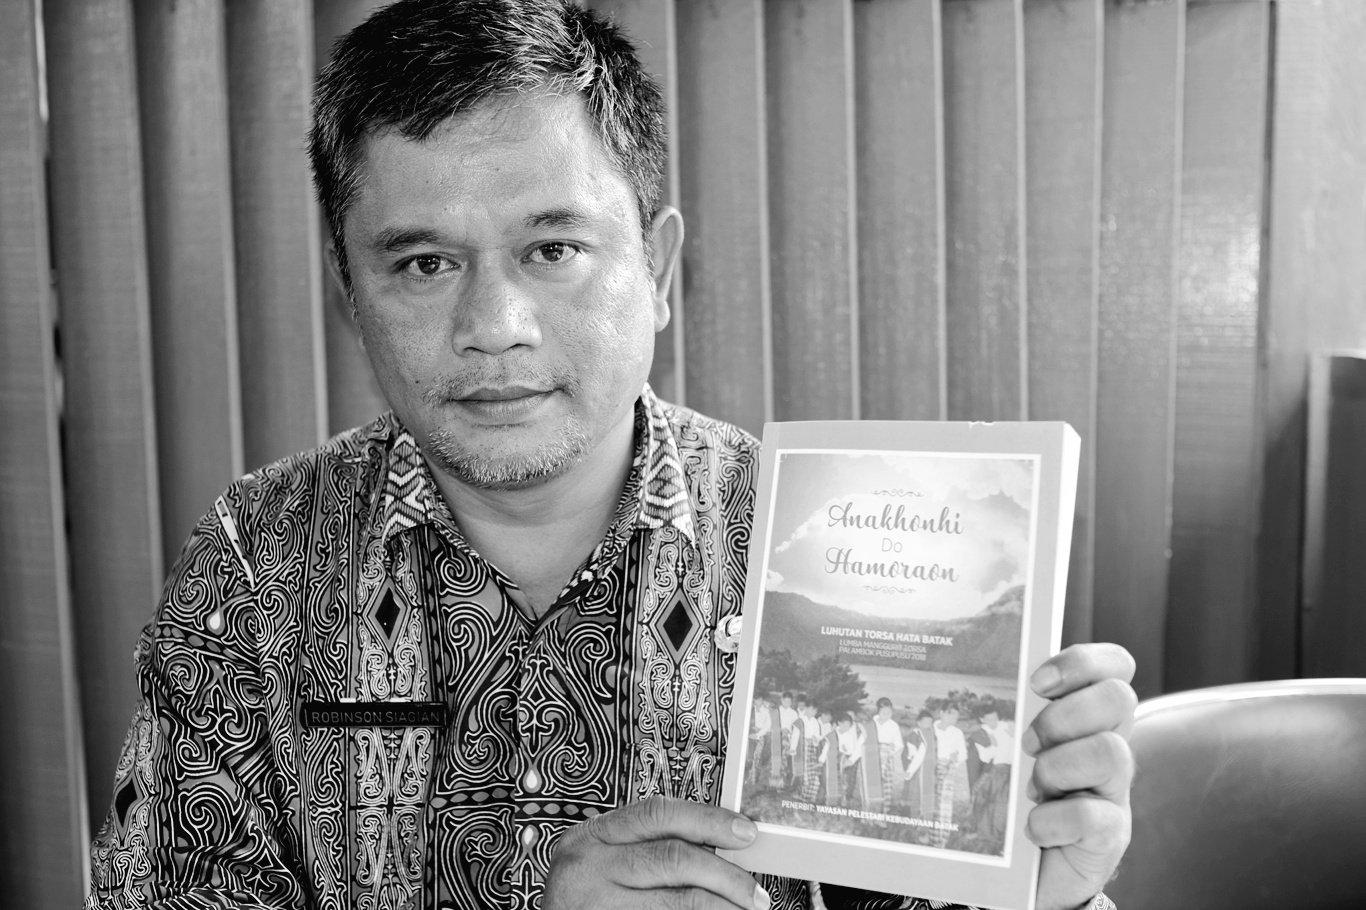 Siagian Humas Toba Samosir - buku cerpen berbahasa Batak